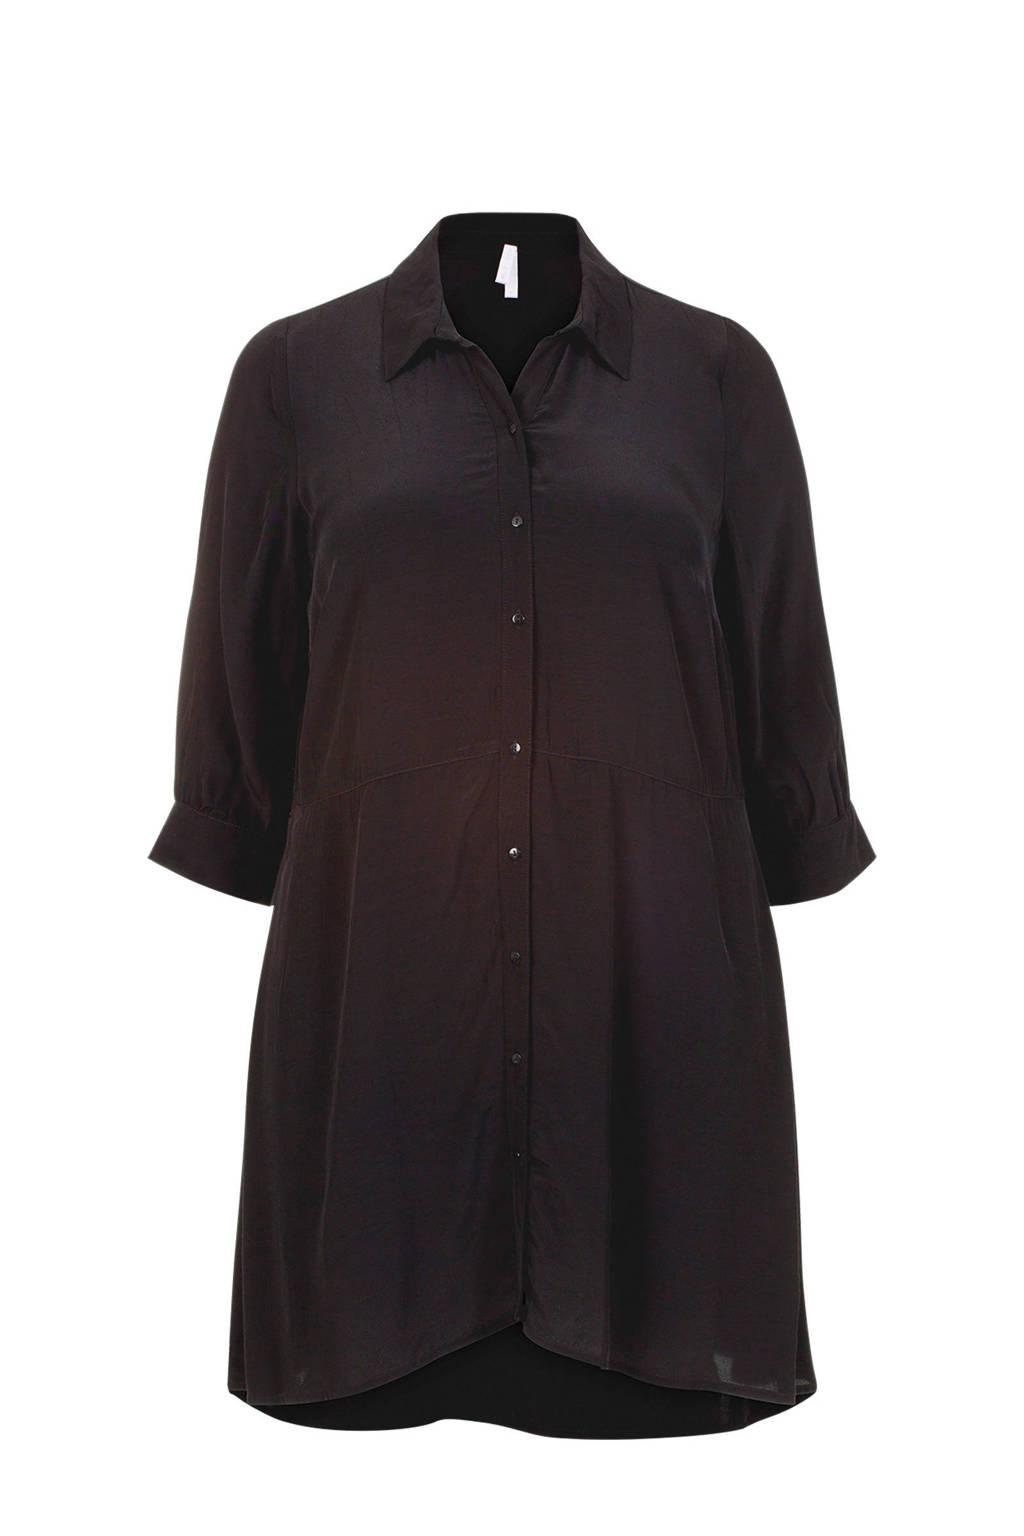 Miss Etam Plus blousejurk zwart, Zwart